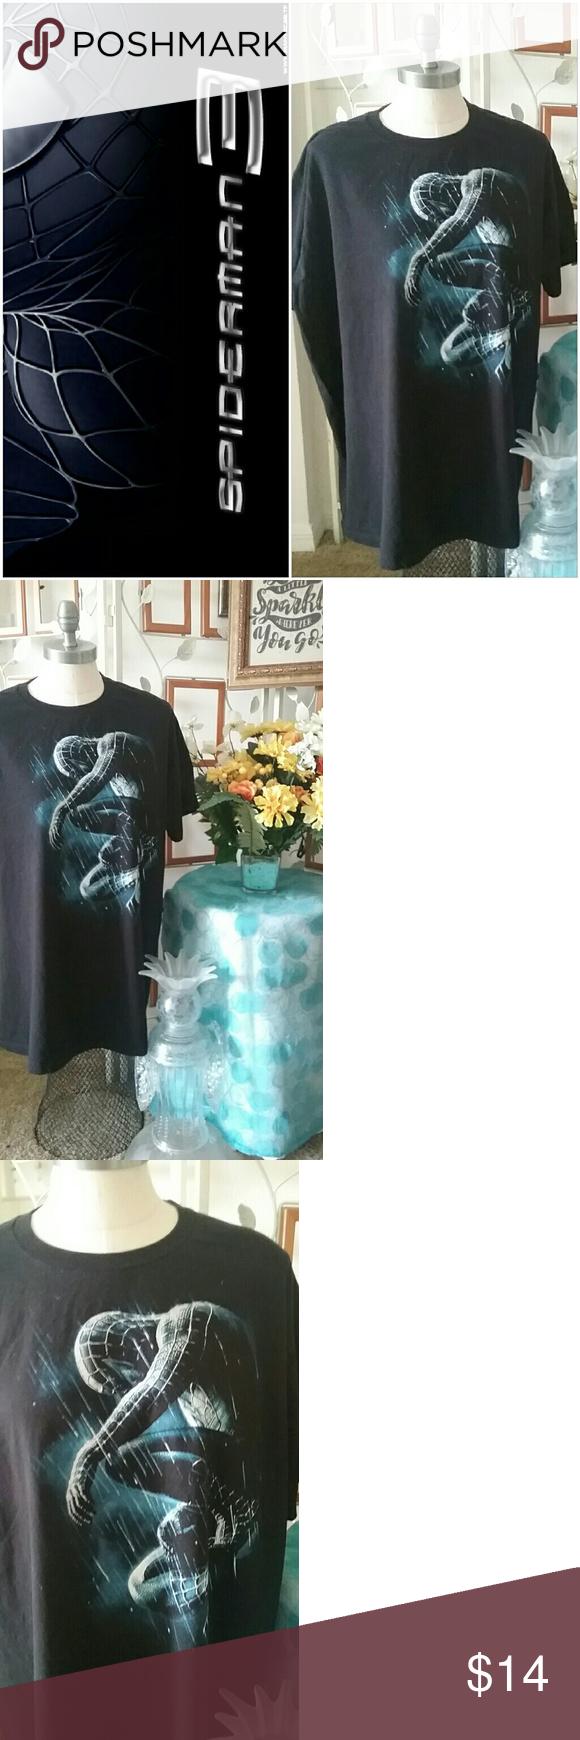 Spider Man 3 Graphic T Shirt Fans Of Black Suit Spider Man Black Spidy Sitting In The Rain Graphic Very Good Use Clothes Design Fashion Men S Graphic T Shirt